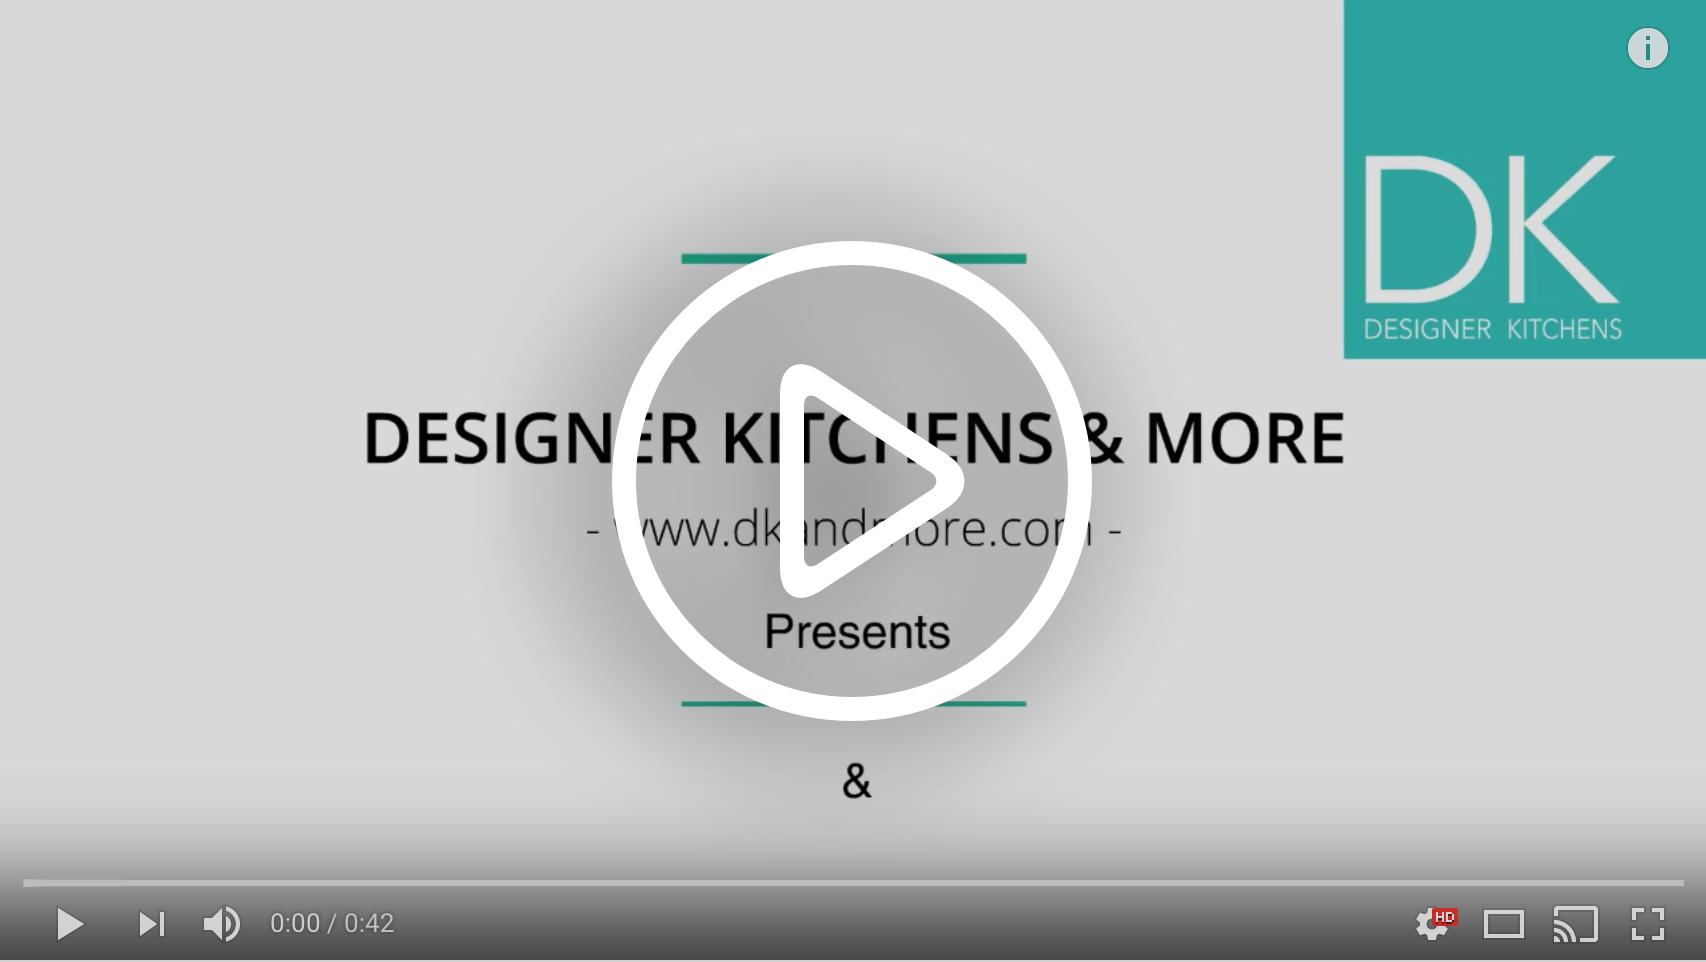 Designer Kitchens and More